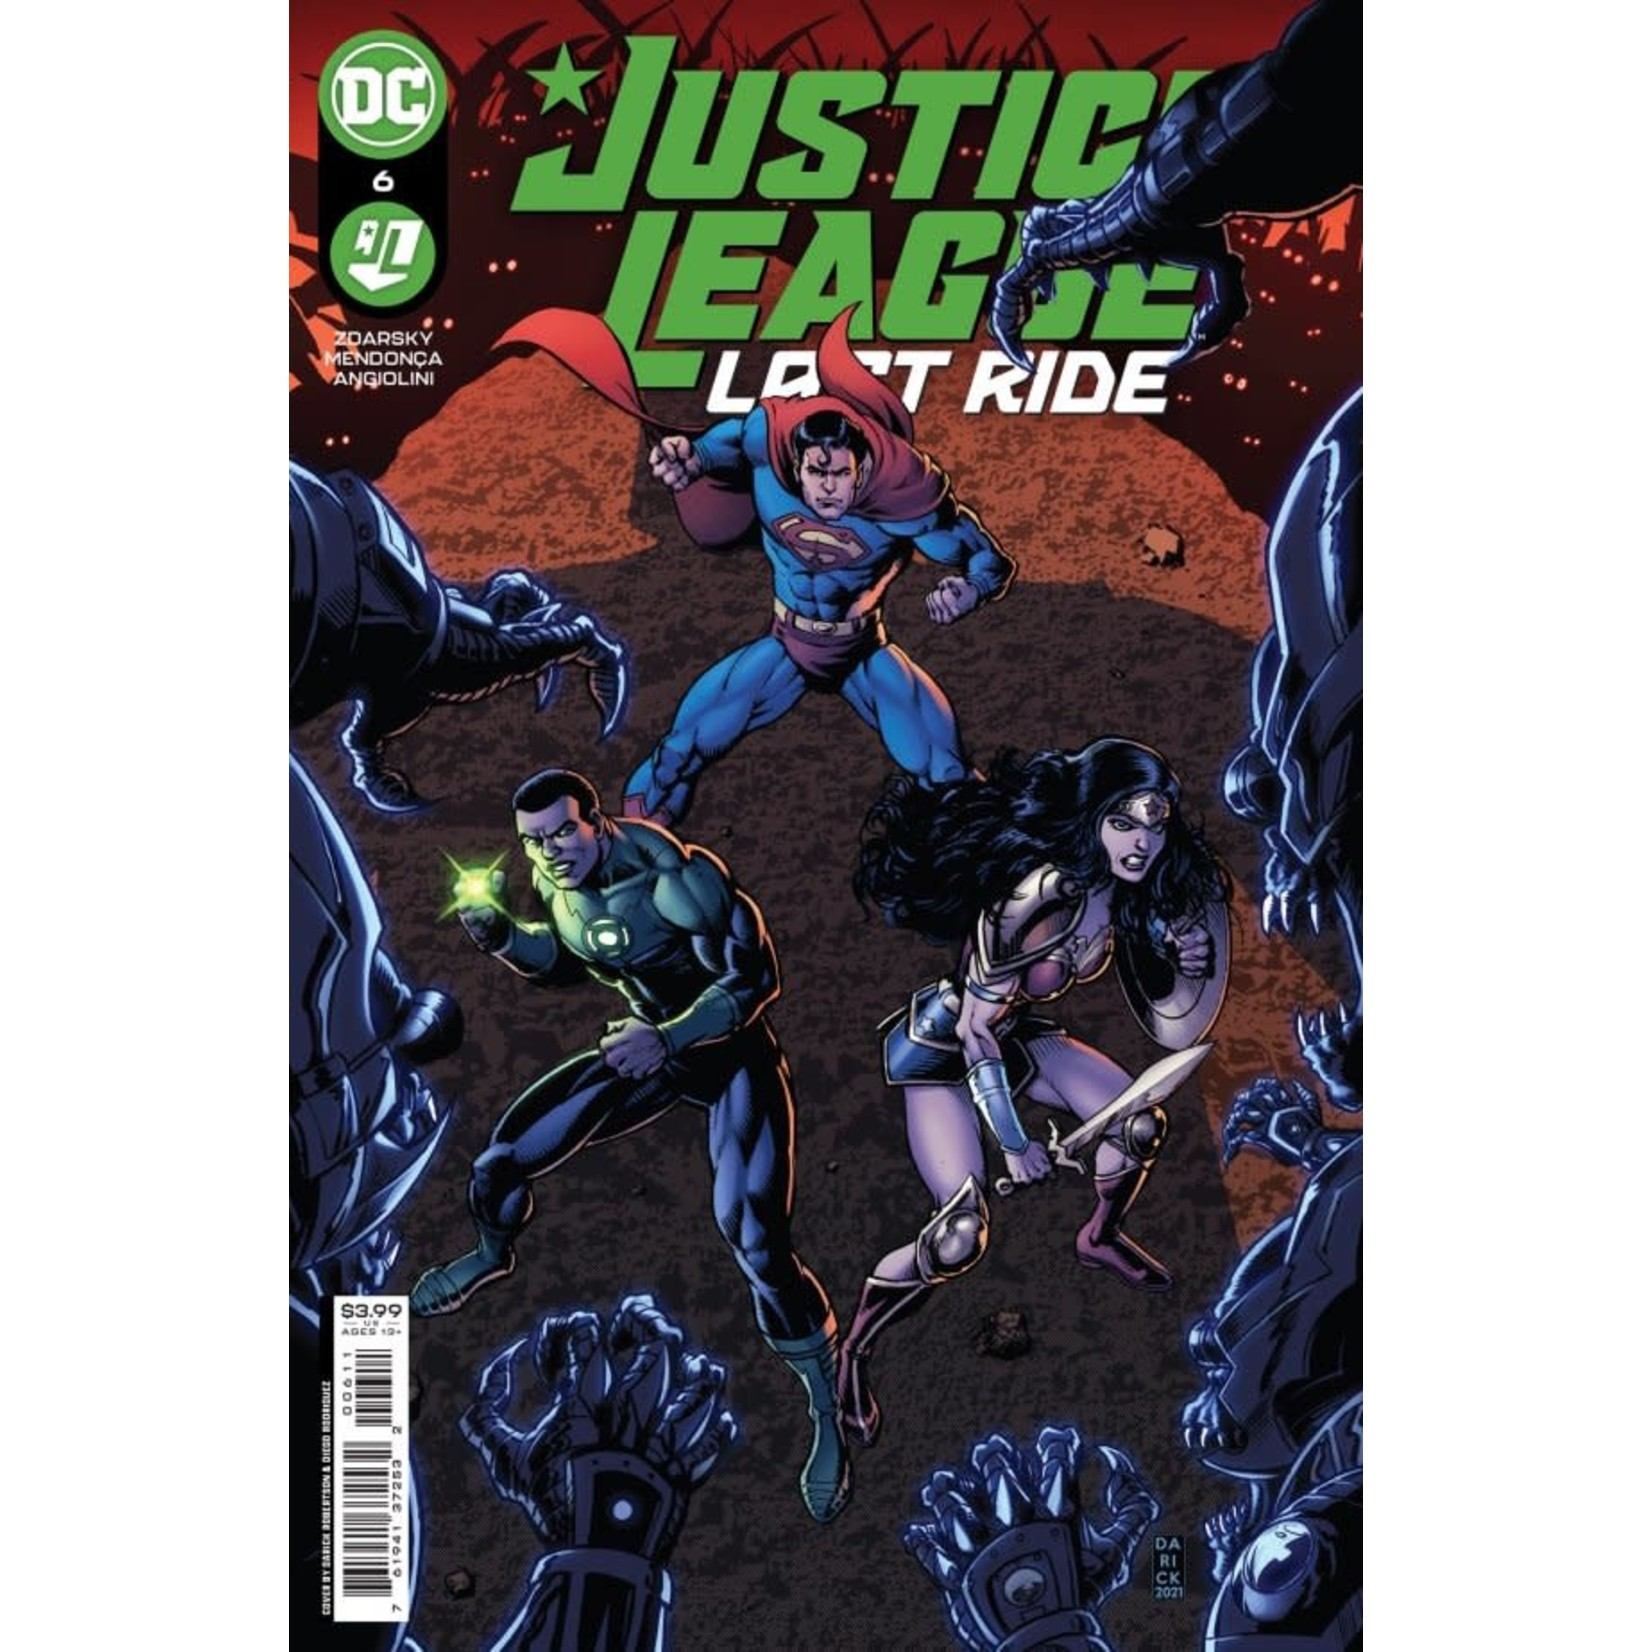 DC Comics Justice League: Last Ride #6